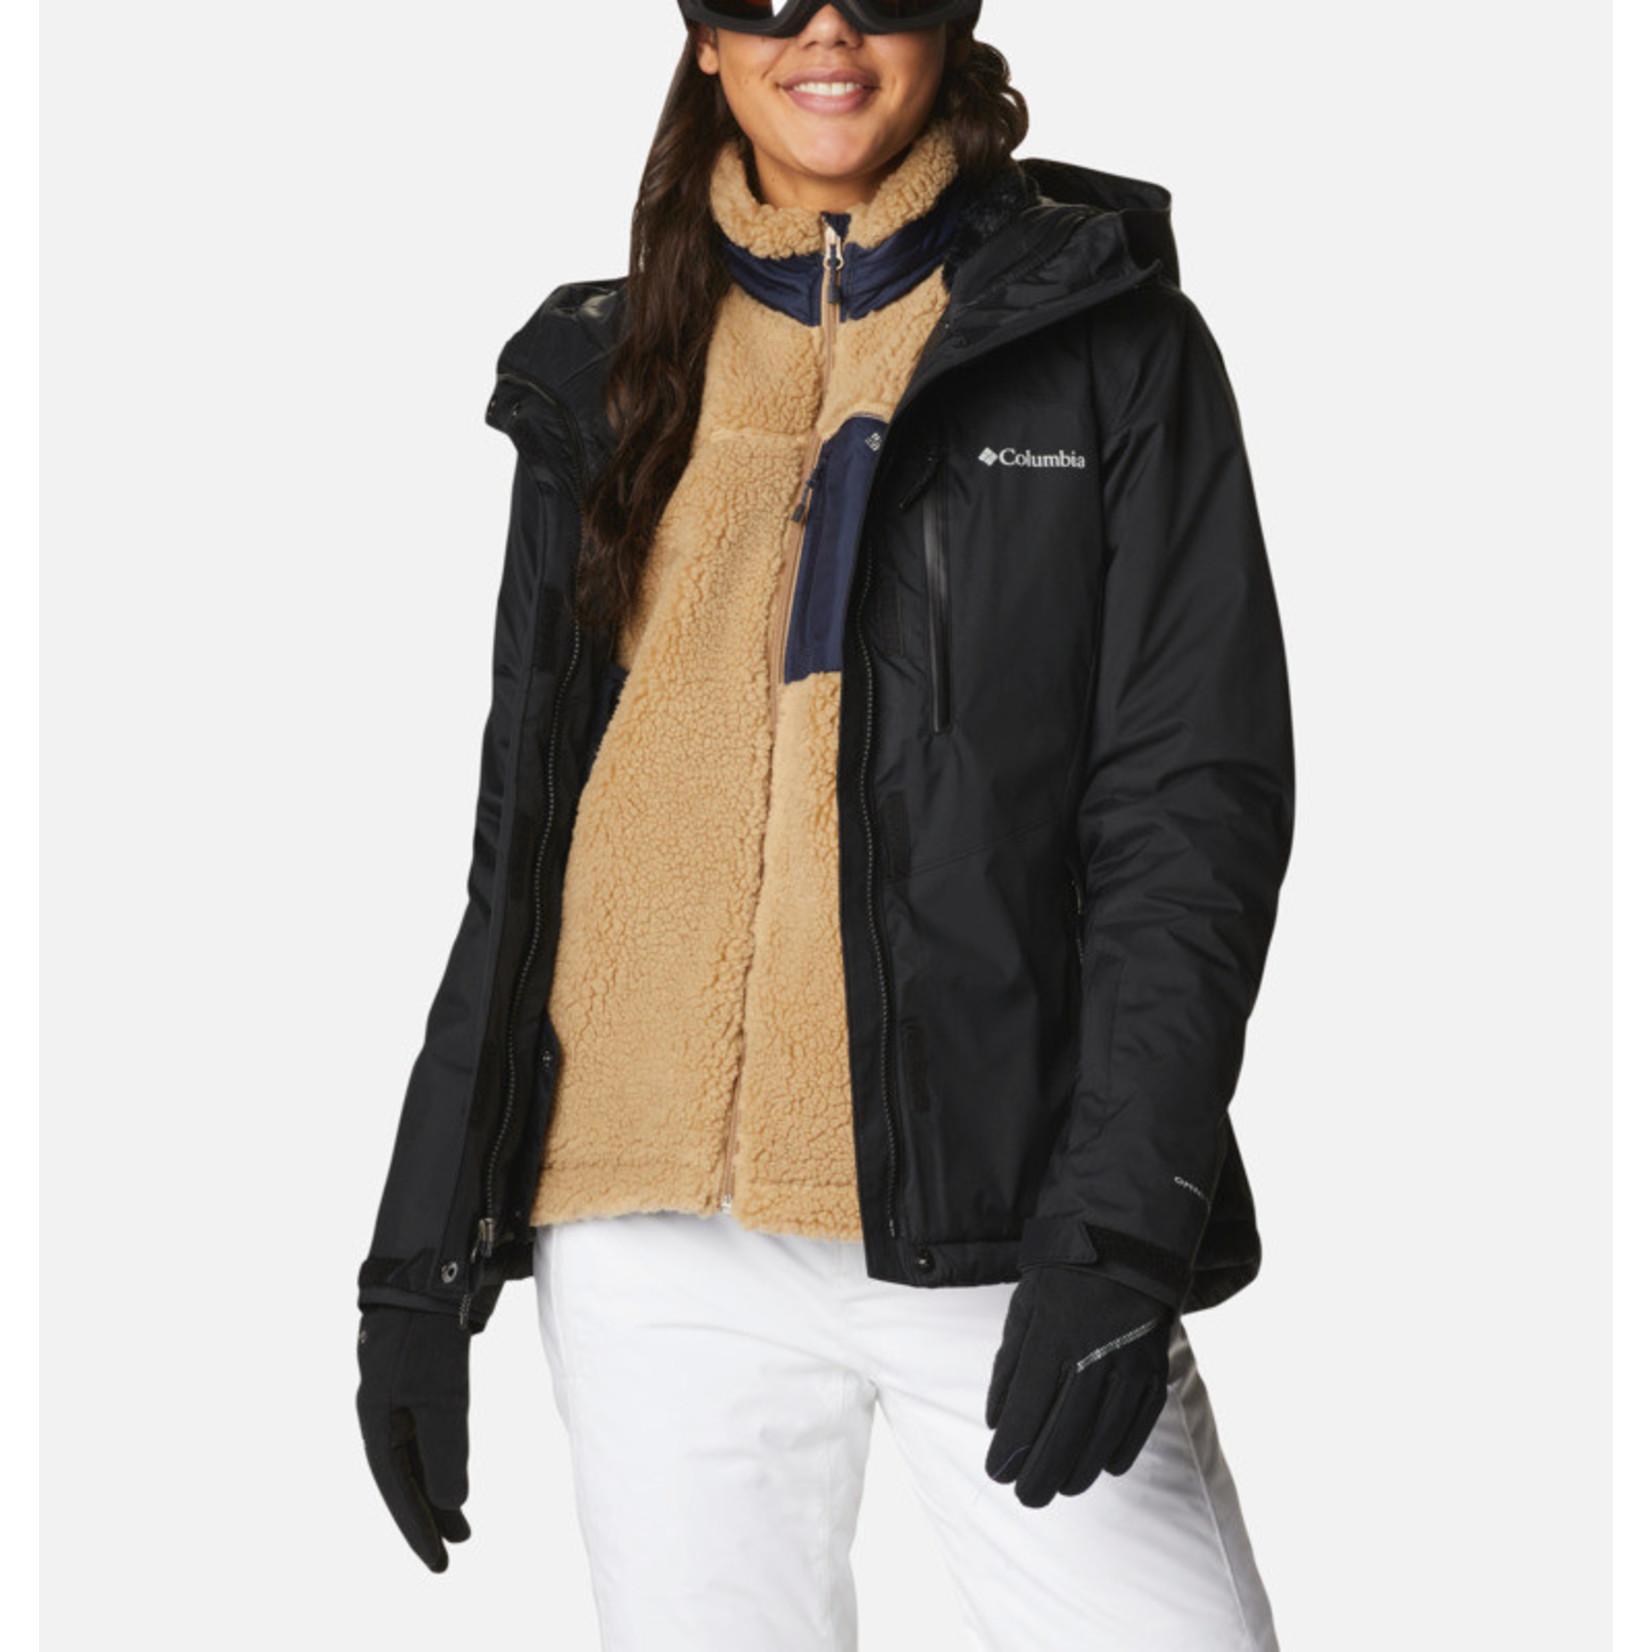 Columbia Columbia Winter Jacket, Last Tracks II Insulated, Ladies